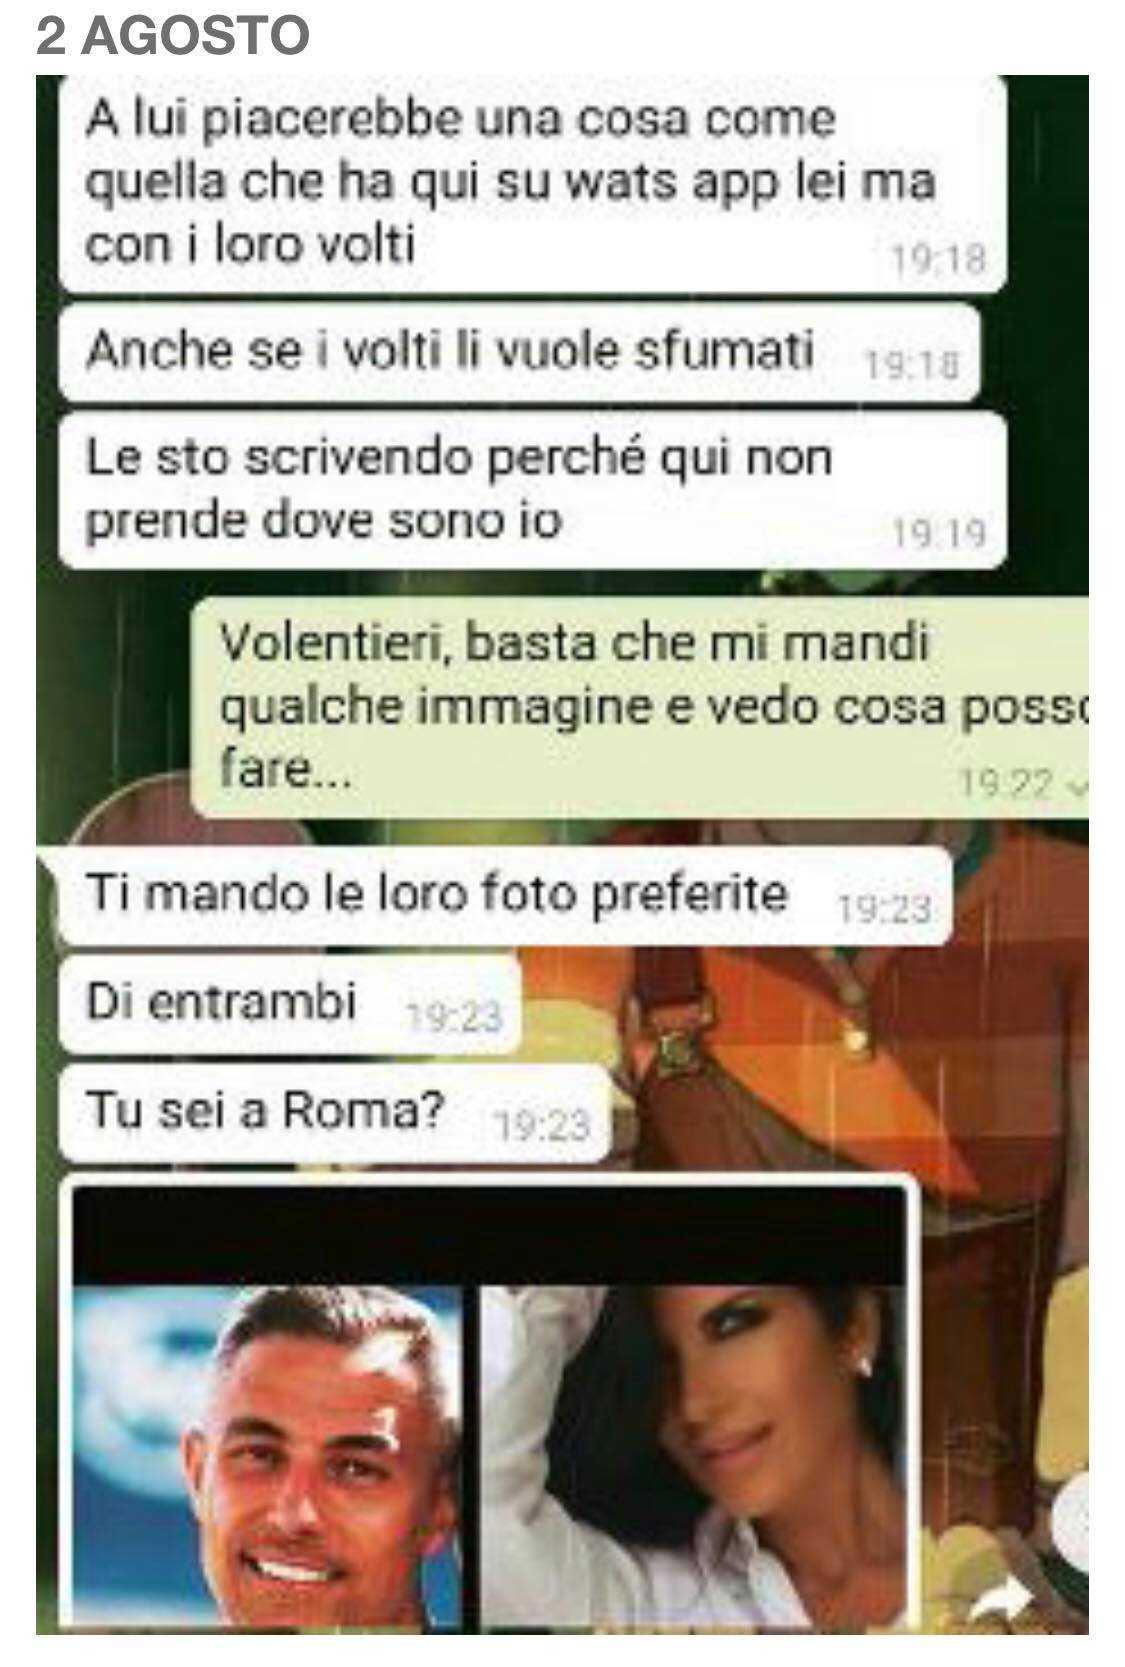 Chat WhatsApp Mark Caltagirone 2